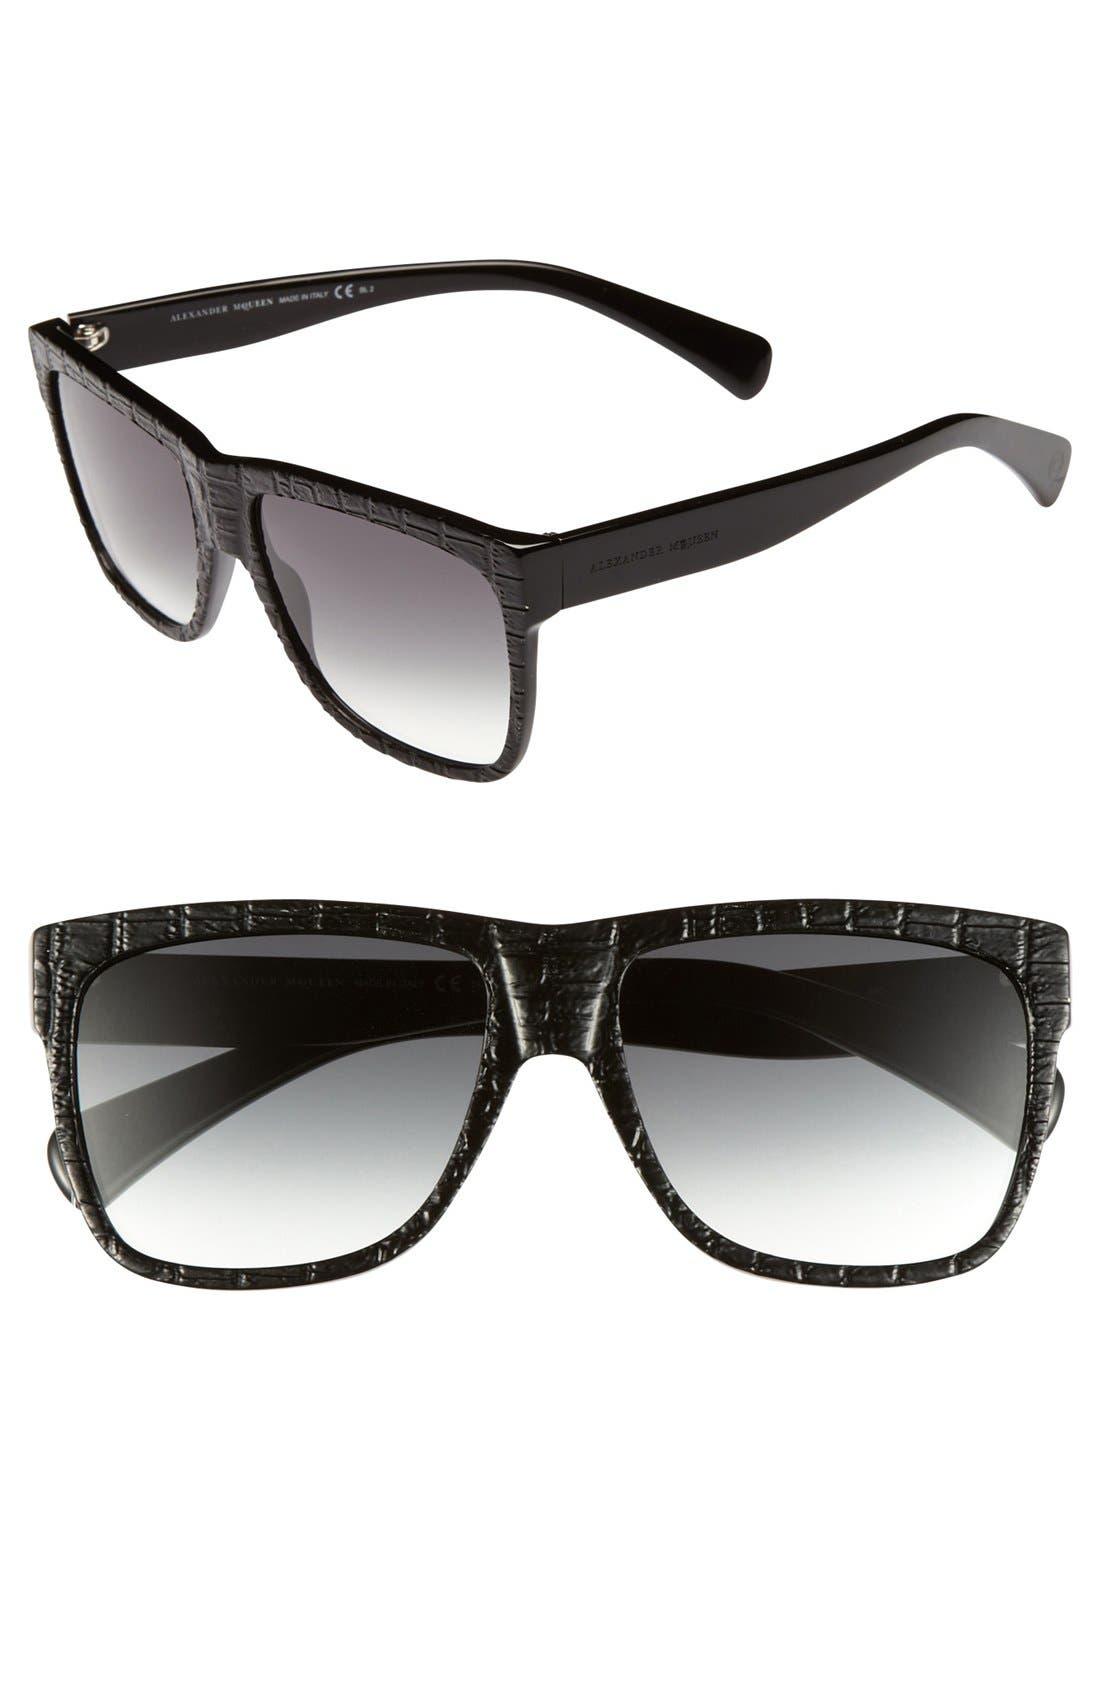 Main Image - Alexander McQueen 55mm Retro Sunglasses